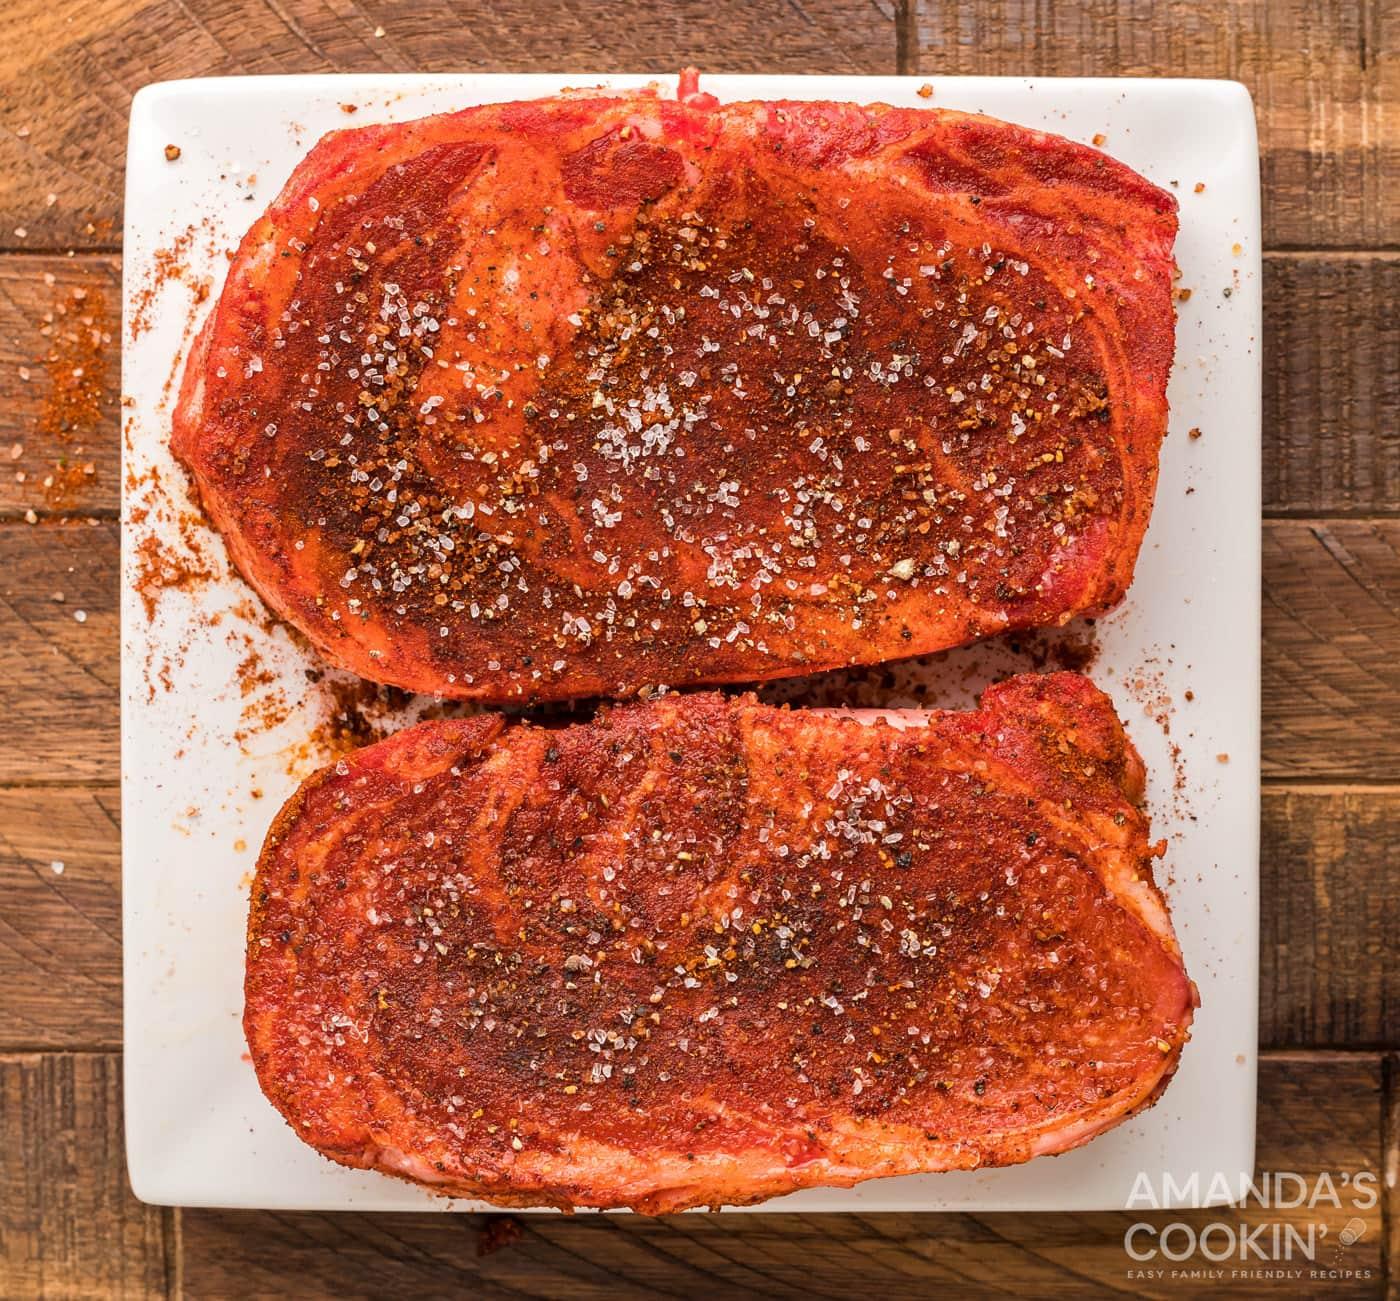 seasoned ribeye on cutting board